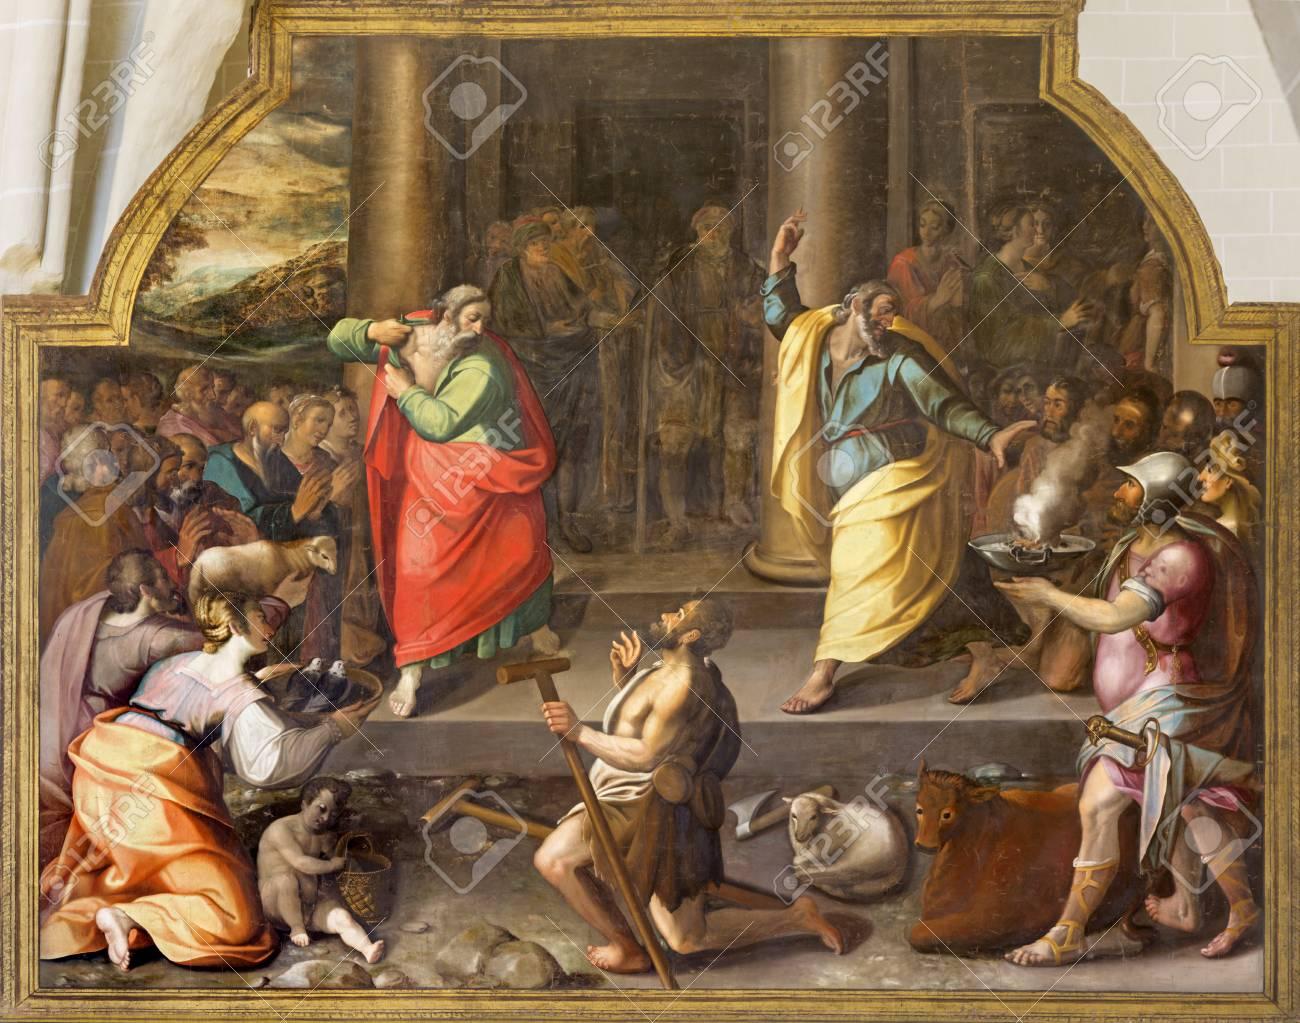 ZARAGOZA, SPAIN - MARCH 3, 2018: The biblical scene of miracel heain of St. Paul and st. Barnabas in Lystra in the church Iglesia de San Pablo by Antonio Glaceran and Jeronimo de Mora (1596). - 117431813